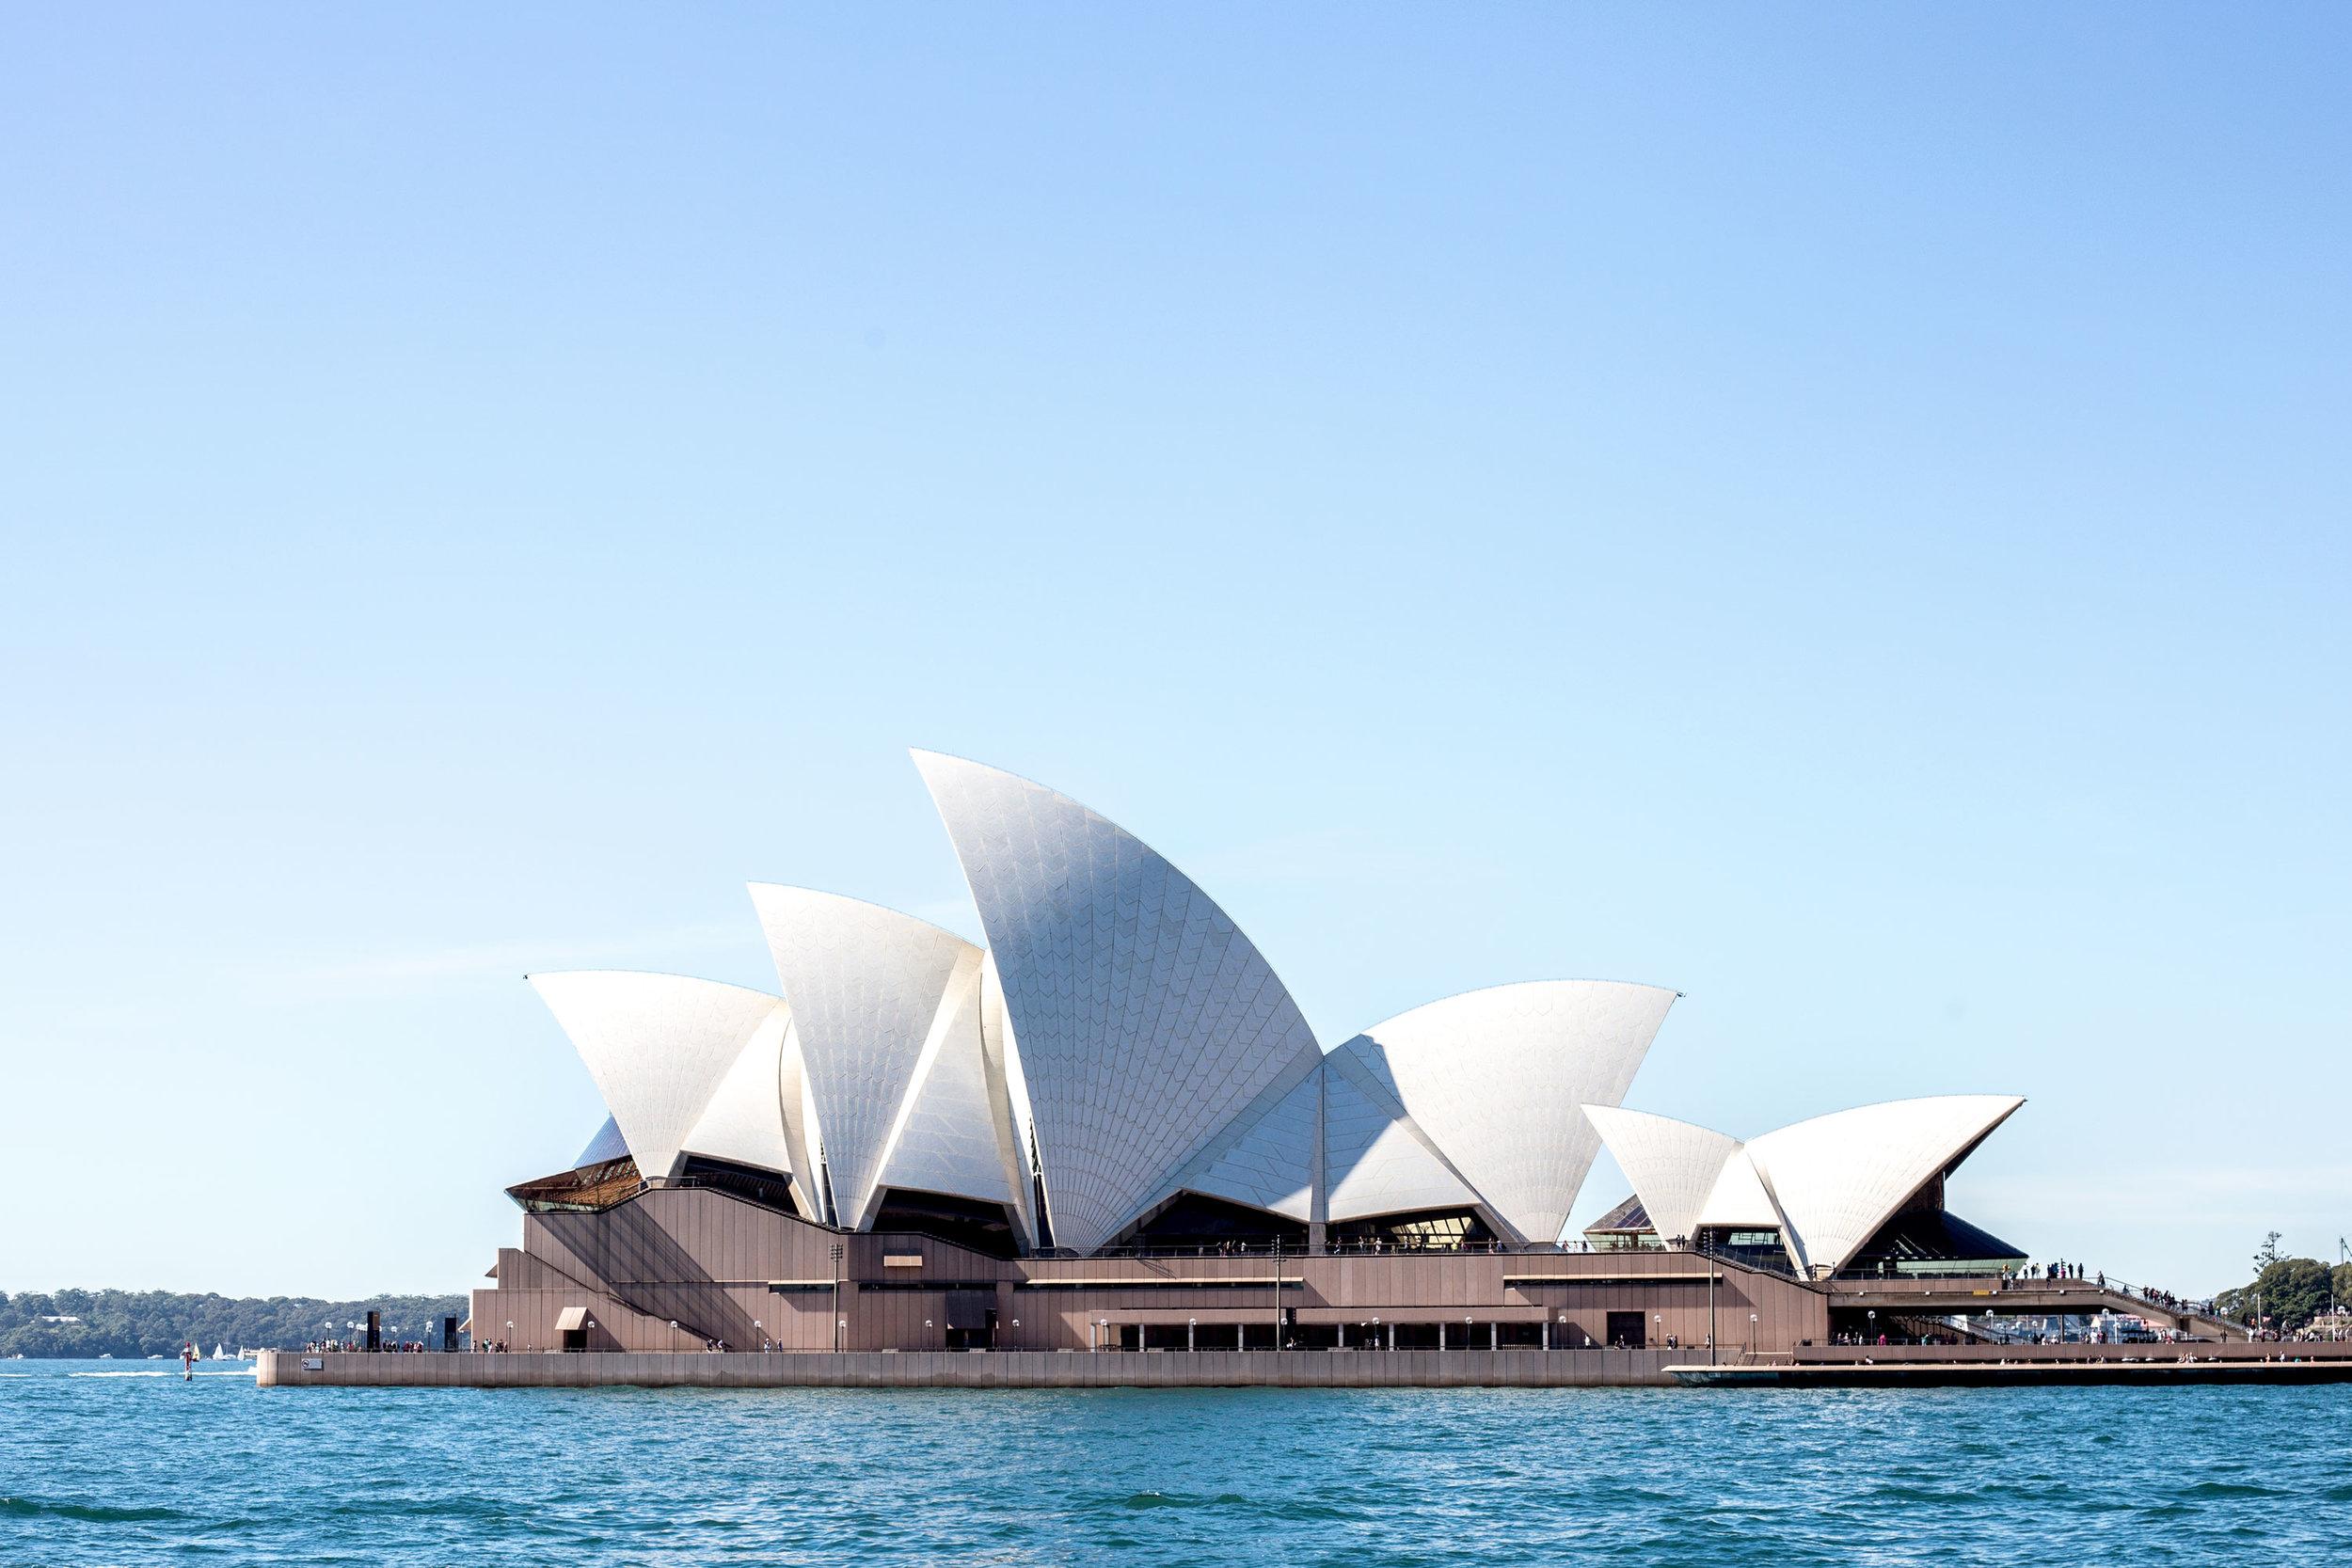 Aerostorie-Sydney-See-Header.jpg